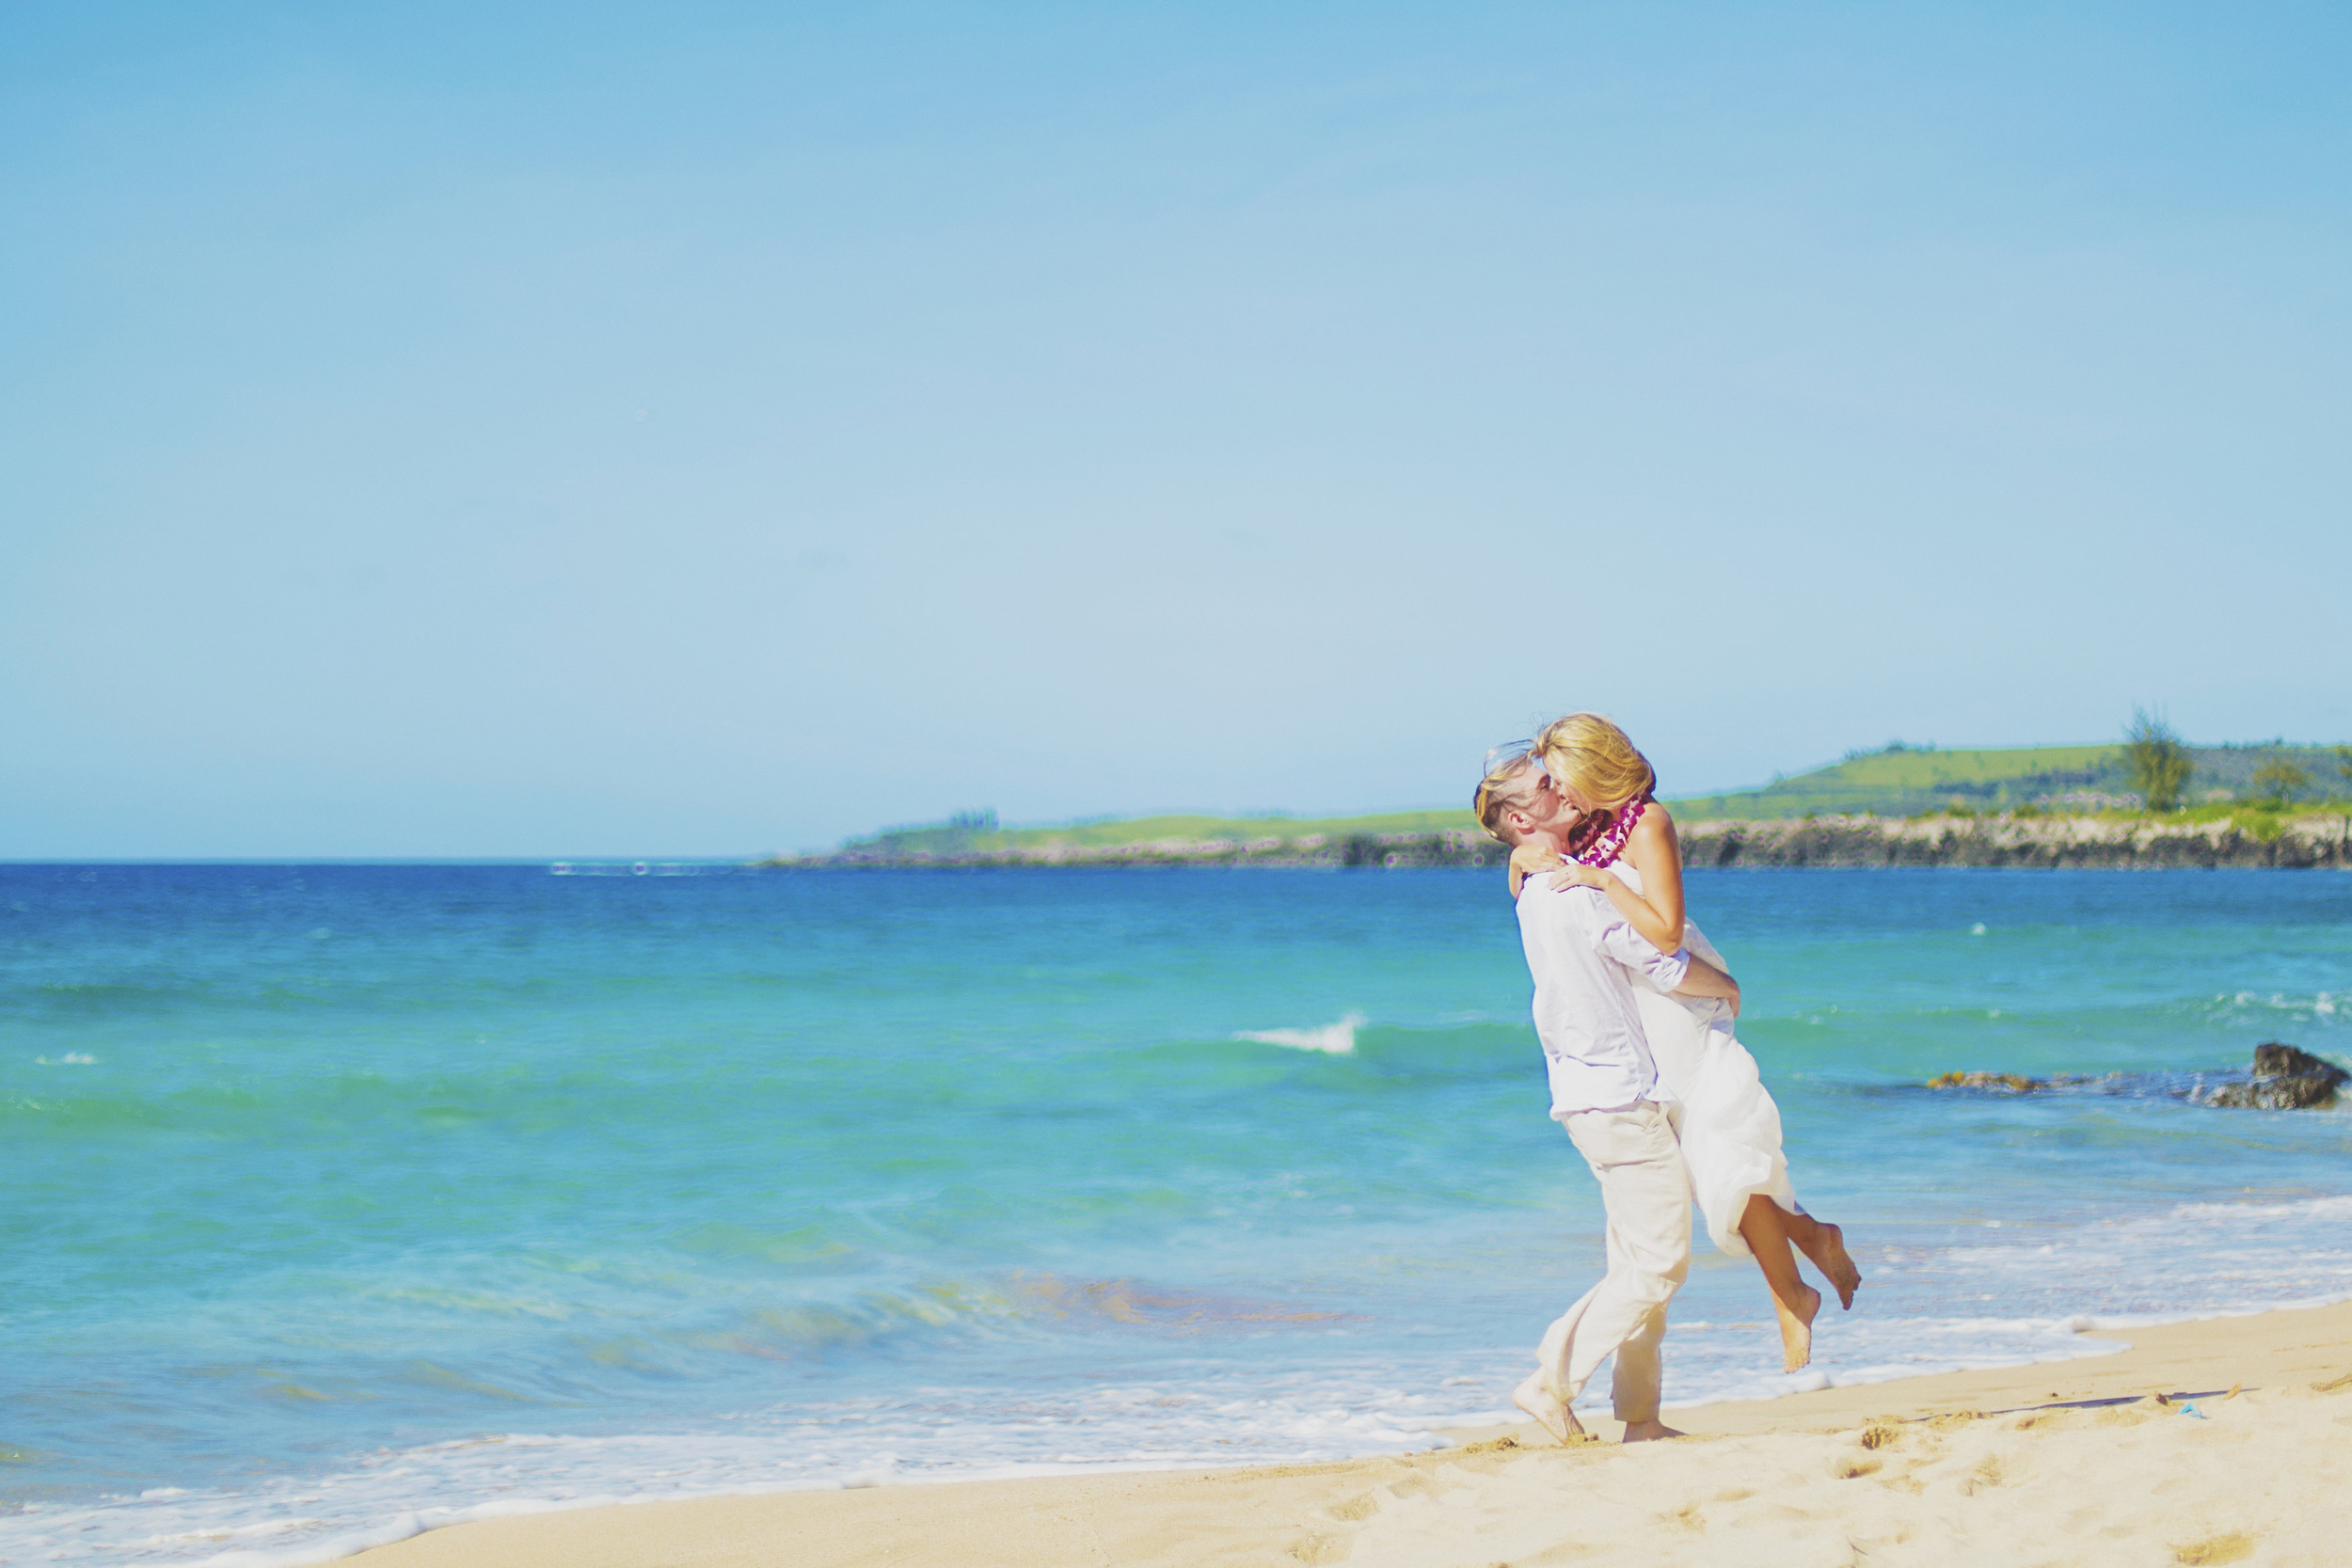 angie-diaz-photography-maui-honeymoon-hawaii-elopement-13.jpg